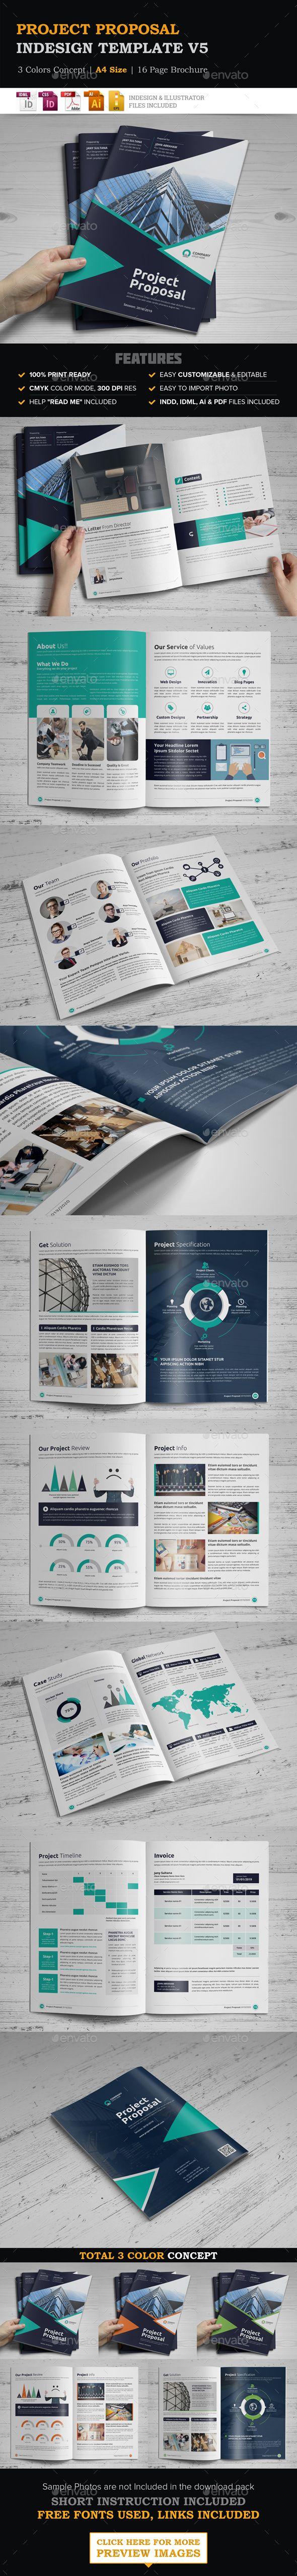 Project Proposal InDesign Template v5 26 best